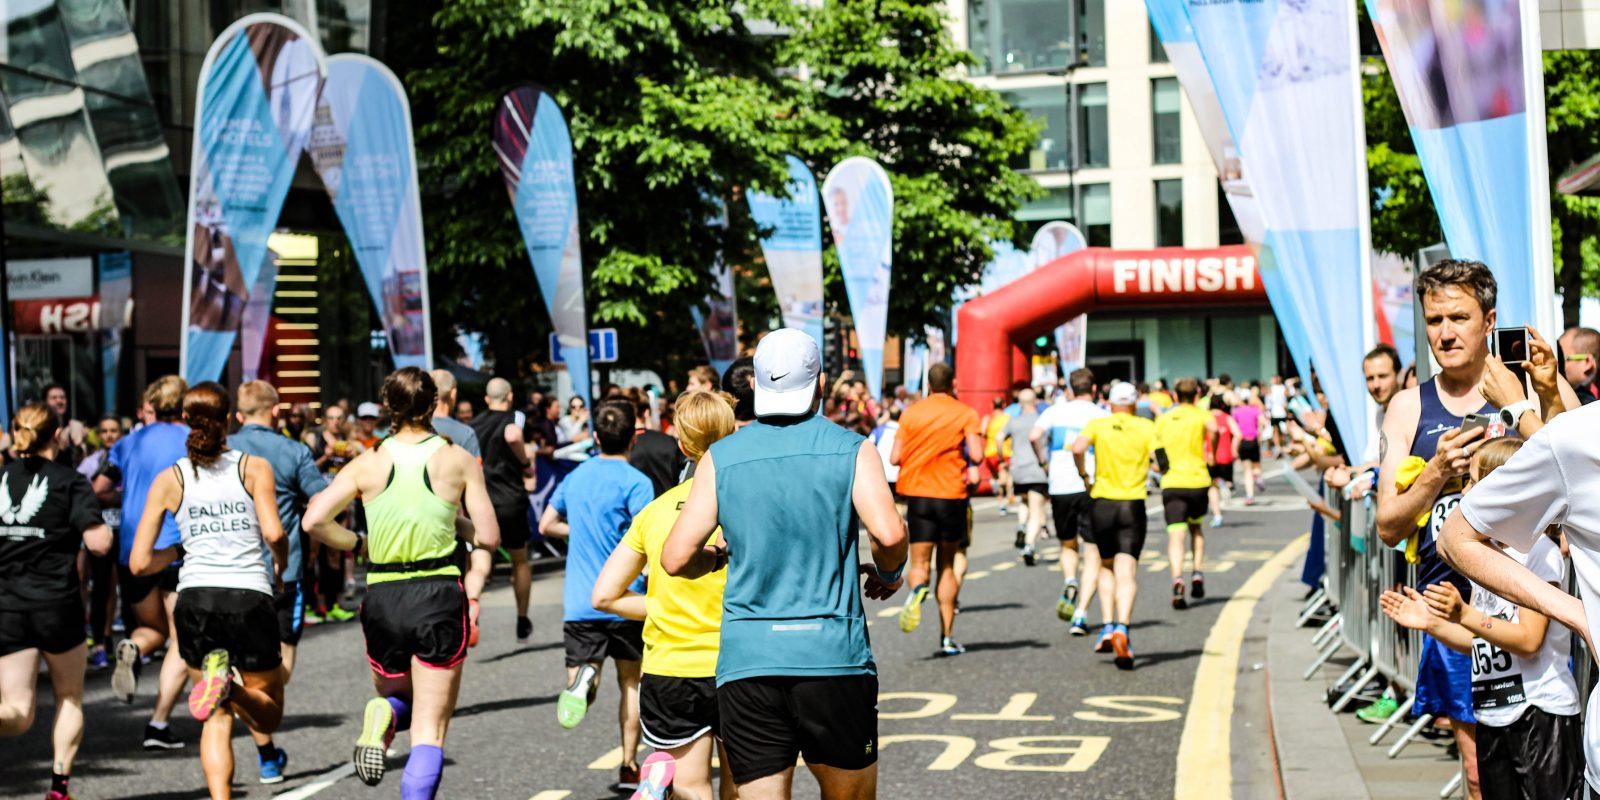 Marathon træning – 10 gode råd